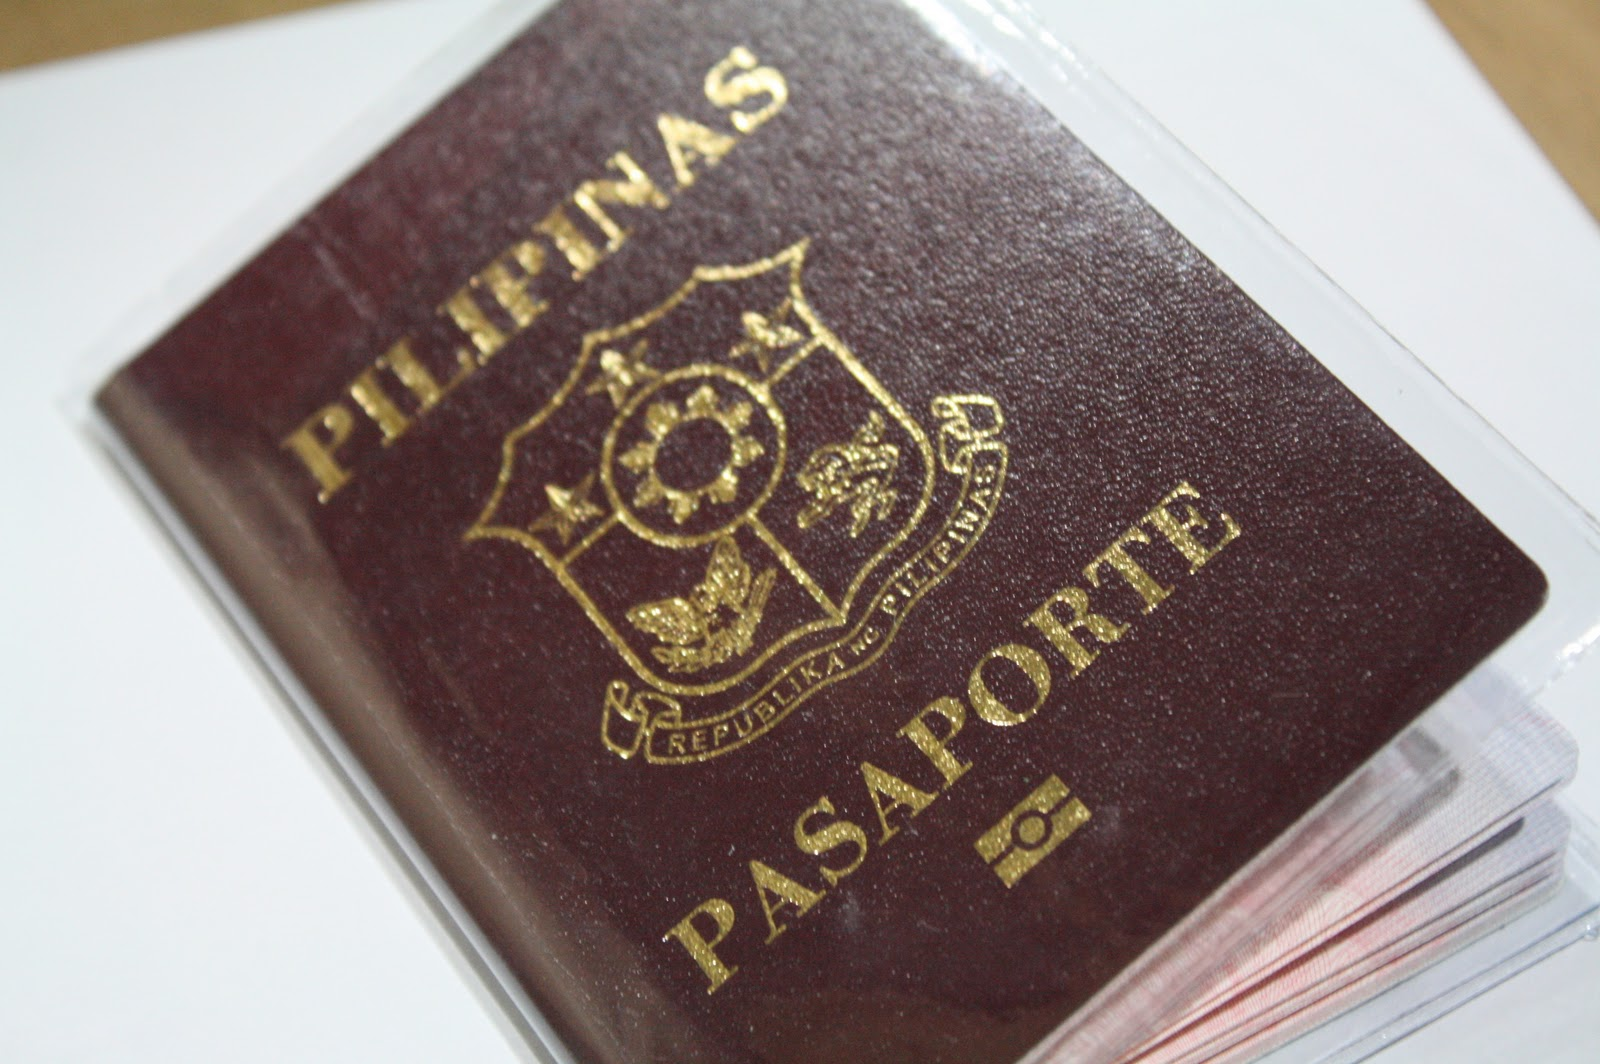 Senate seeks to extend passport validity to 10 years